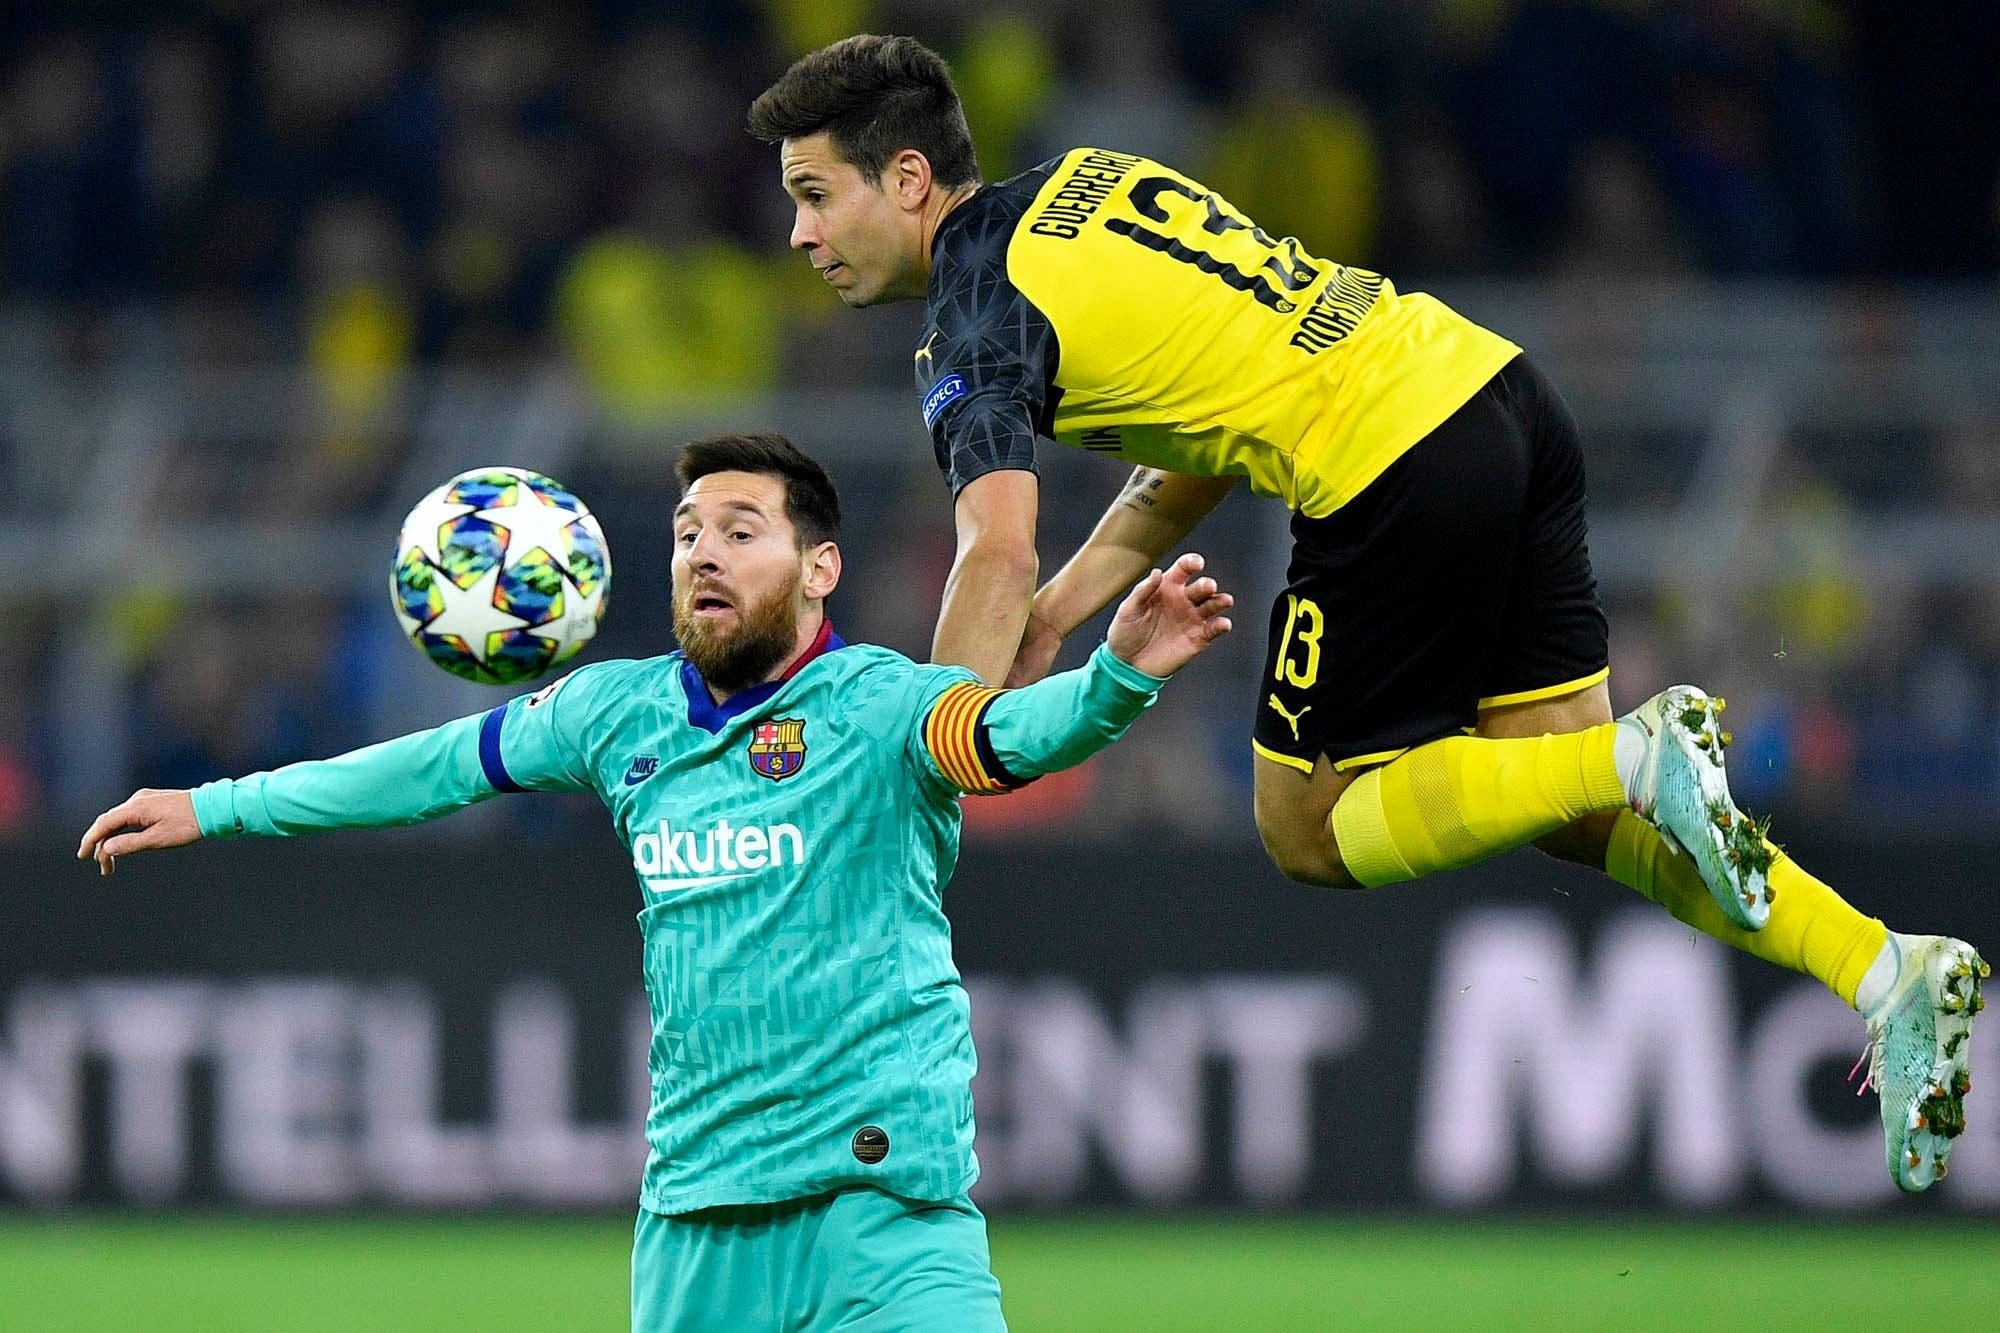 Volvió a jugar Lionel Messi, pero a Barcelona no le alcanzó: empató con Borussia Dortmund por la Champions League